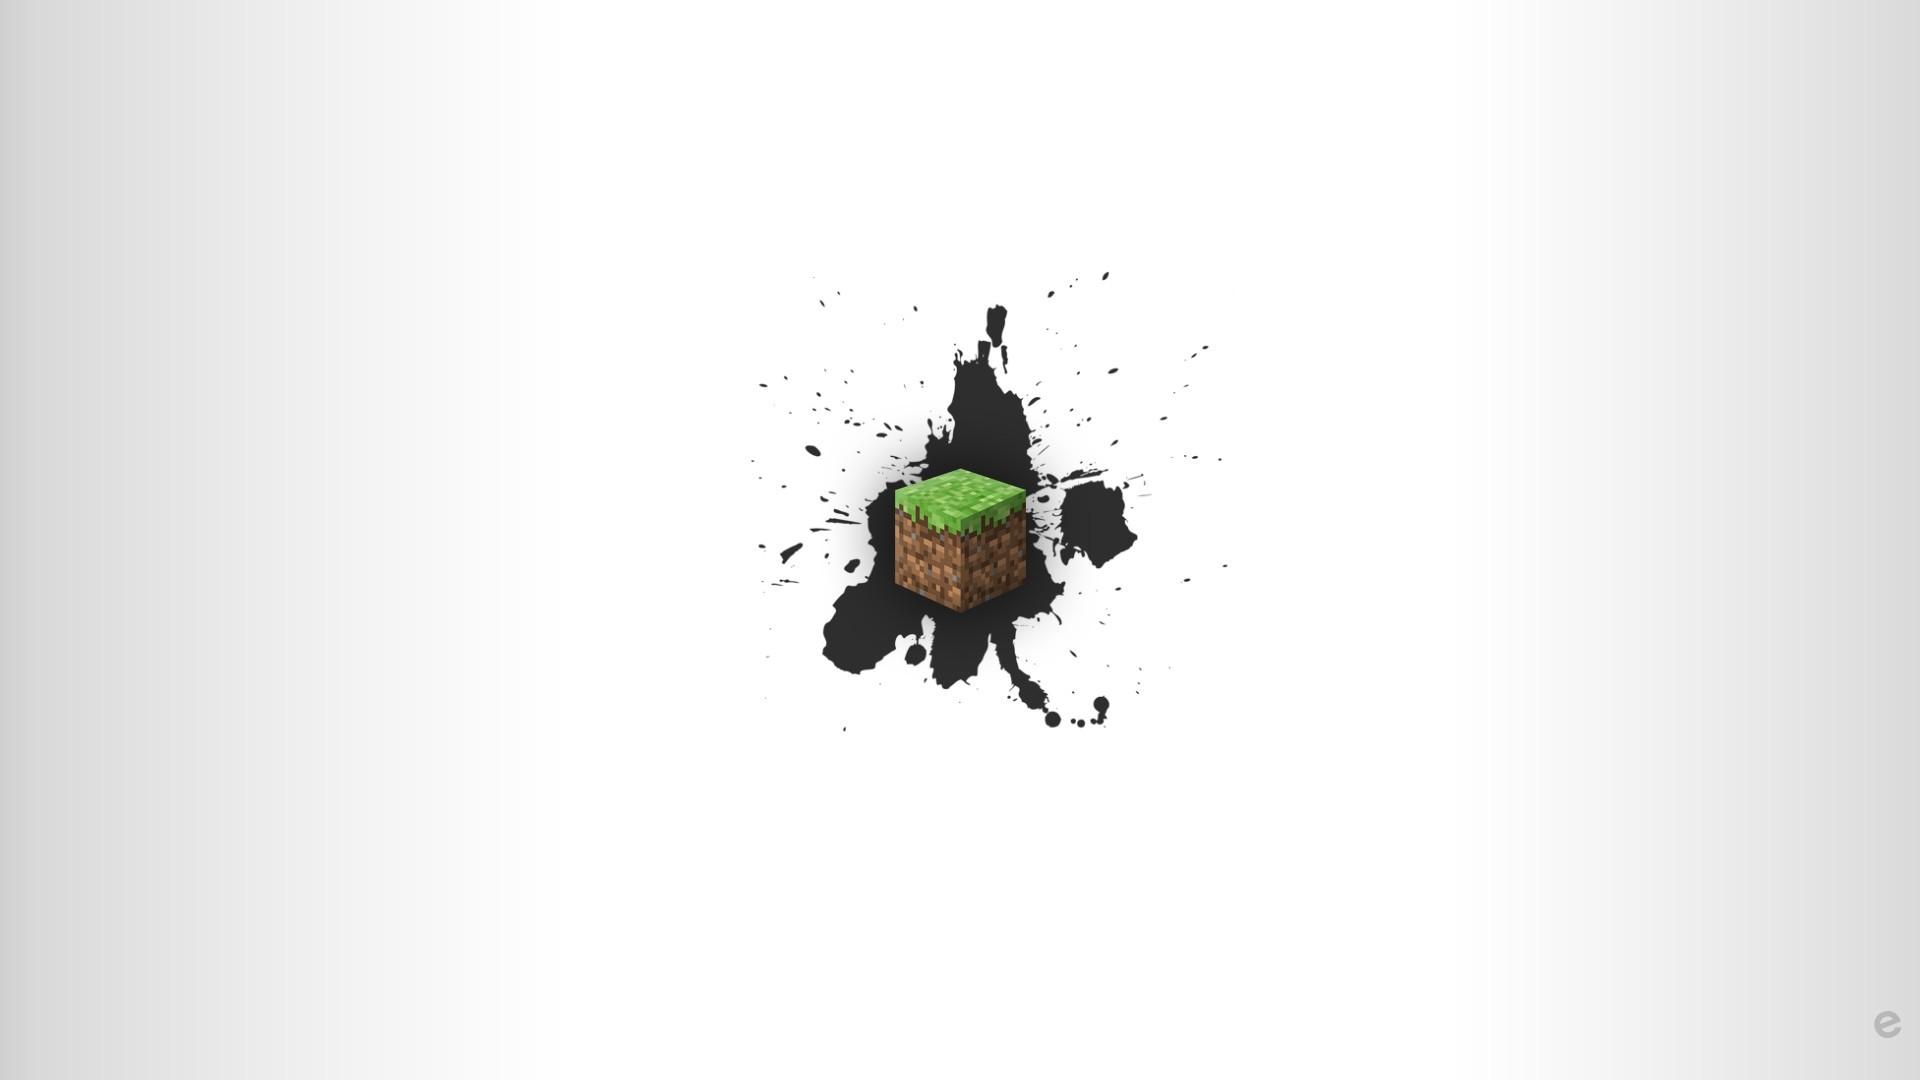 Minecraft Minimalist Wallpaper theme